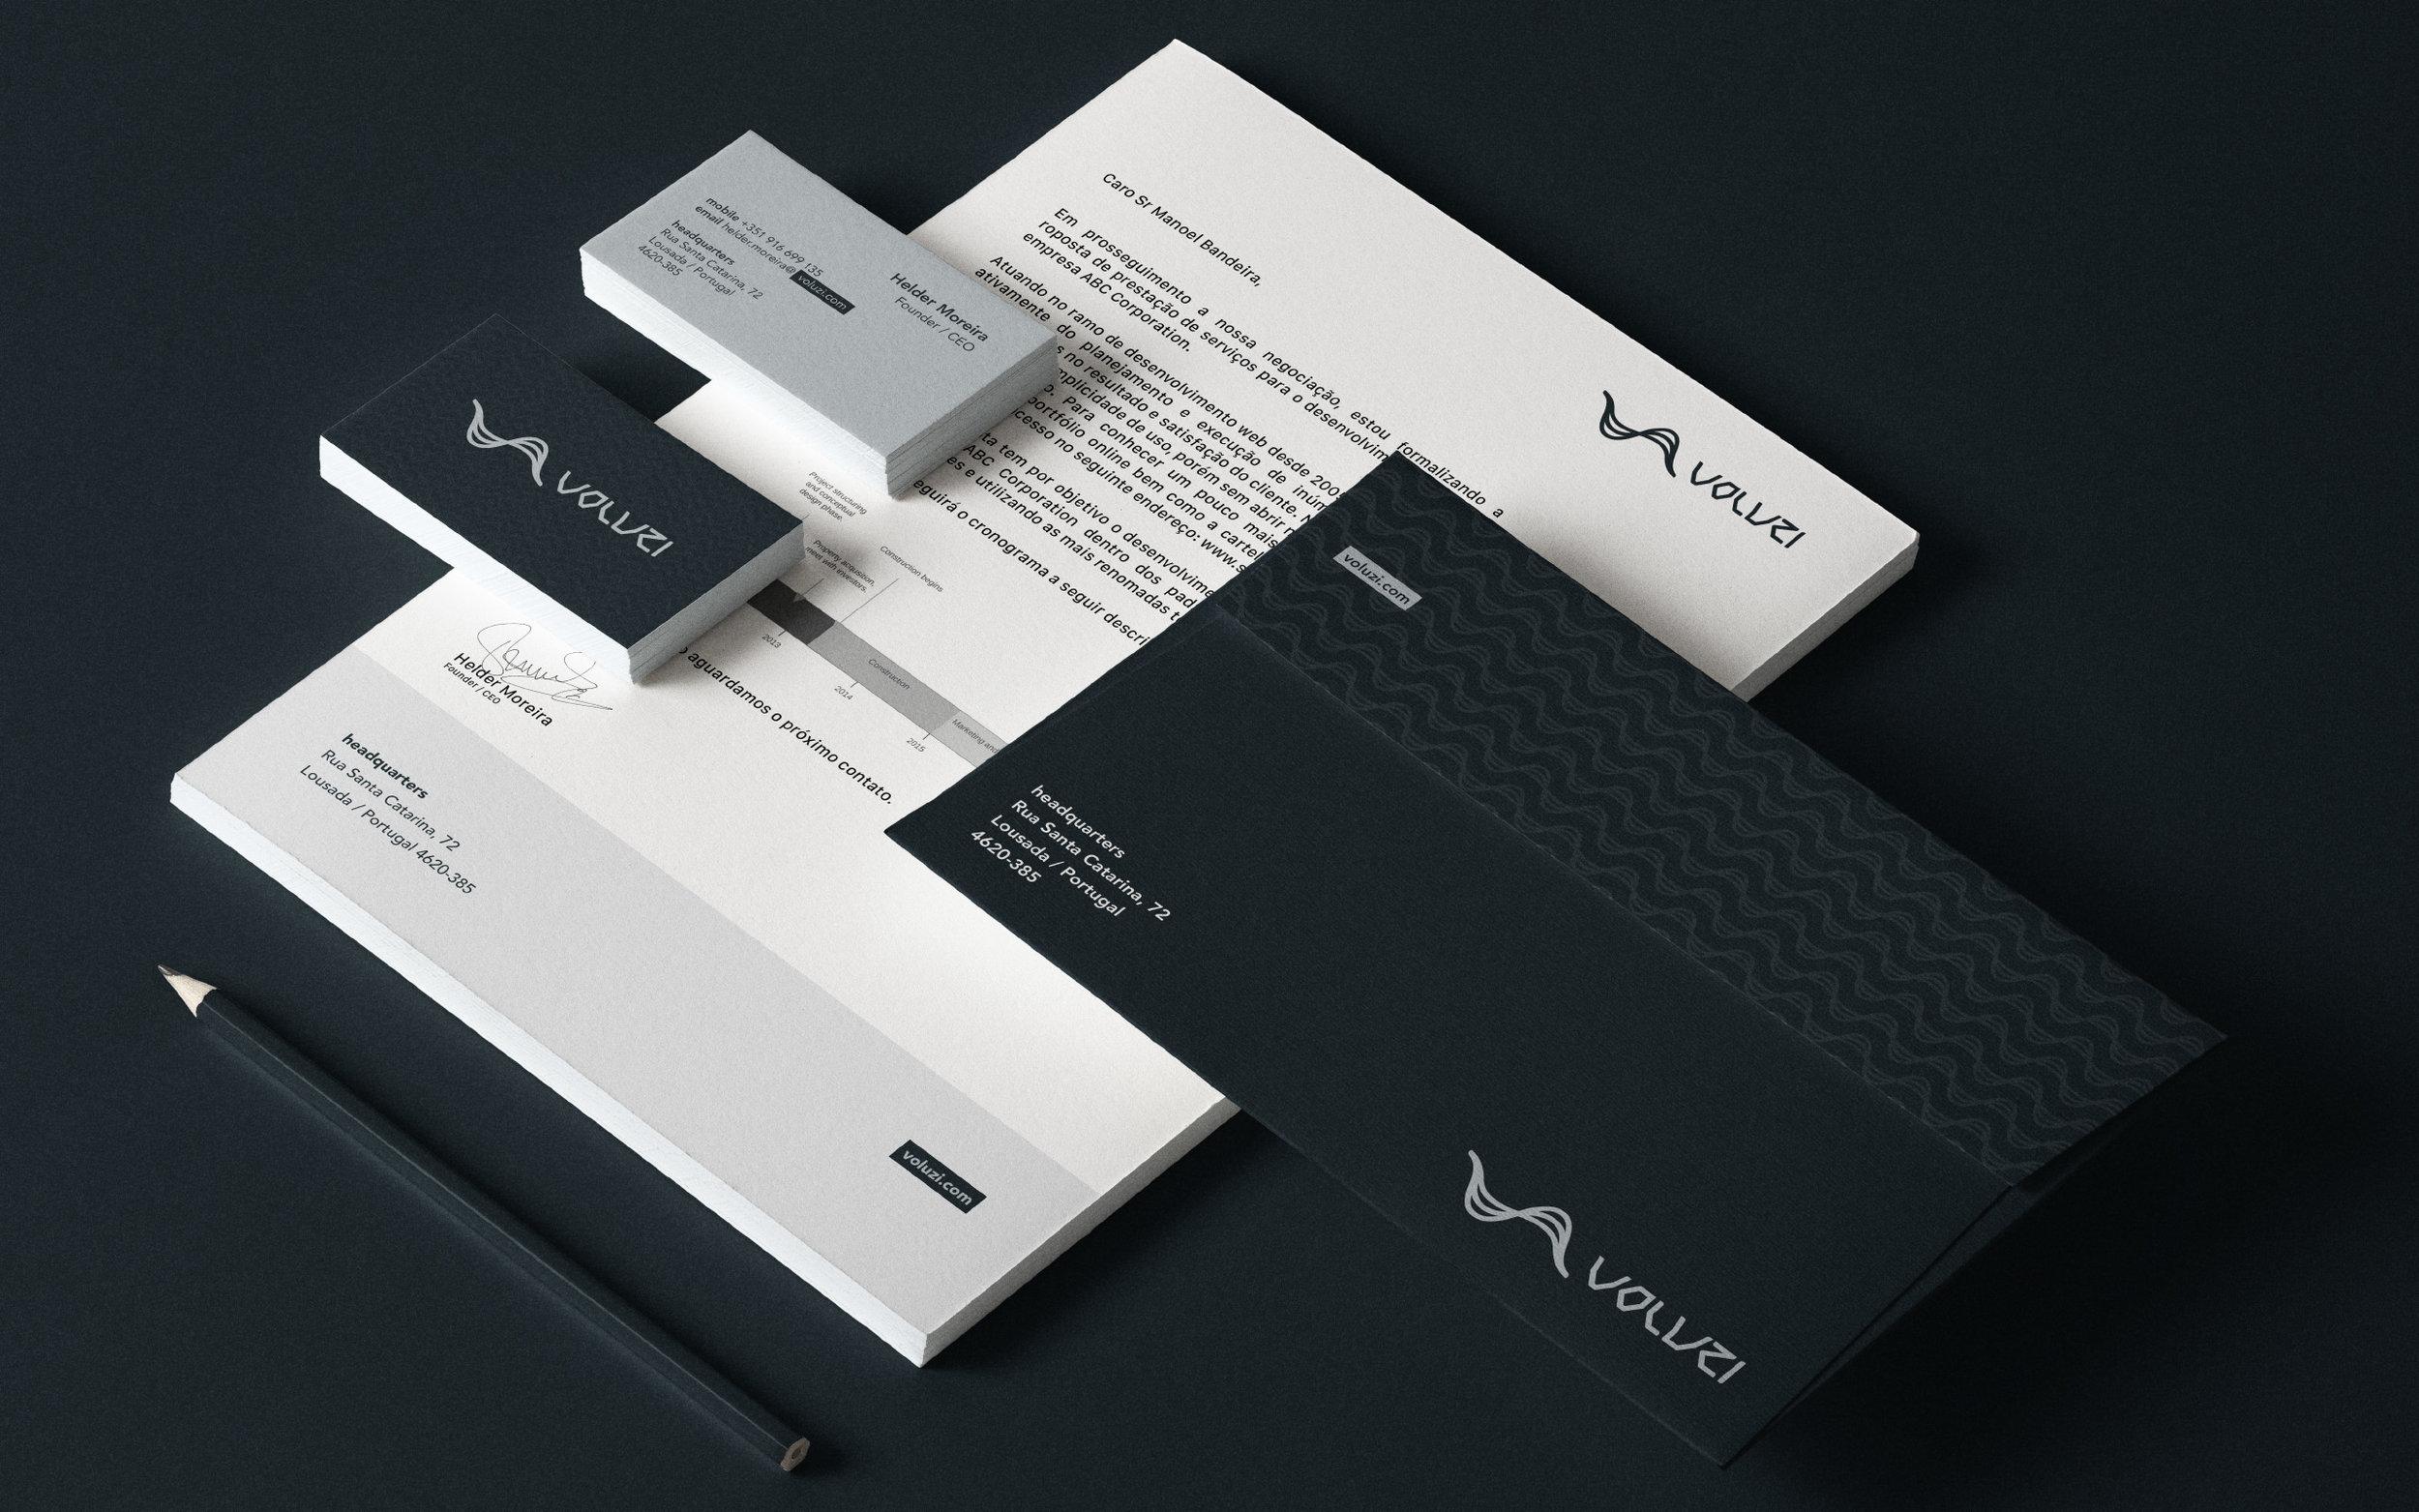 Rafael Maia - Voluzi Corporate Branding25.jpg